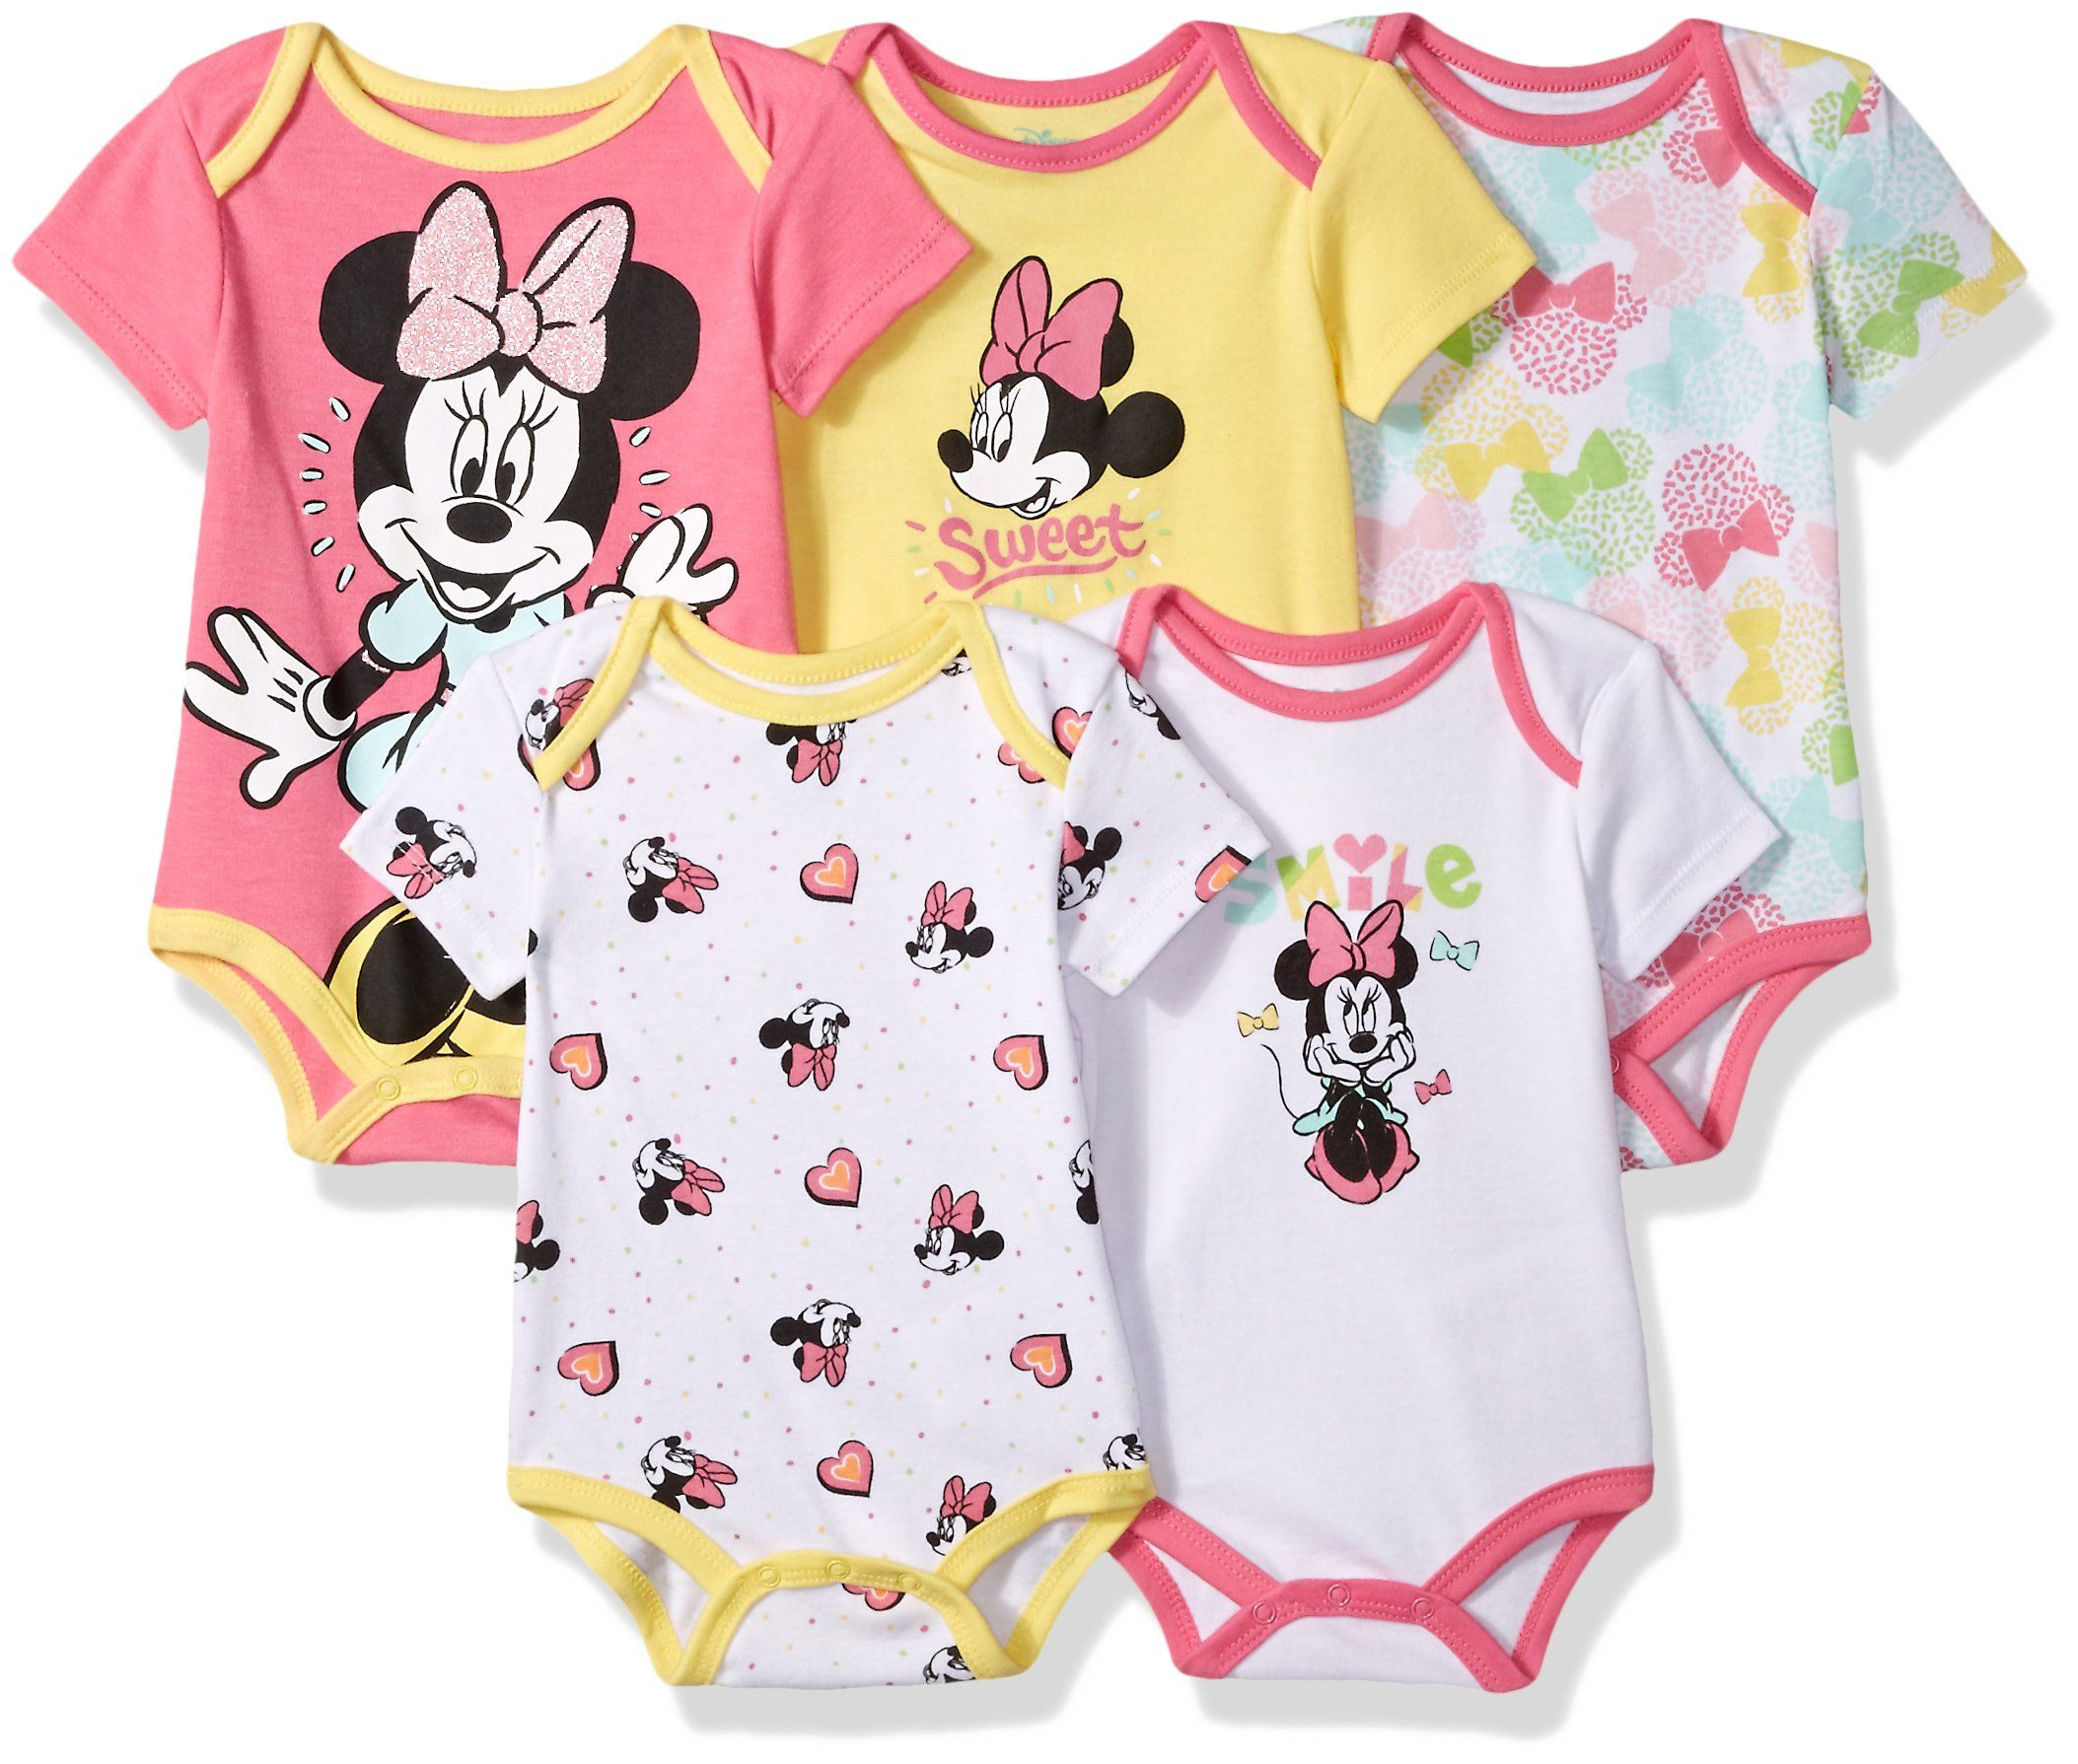 I Love Houston Baby Girl Short Sleeve Romper Jumpsuit Jumpsuit 0-24 Months